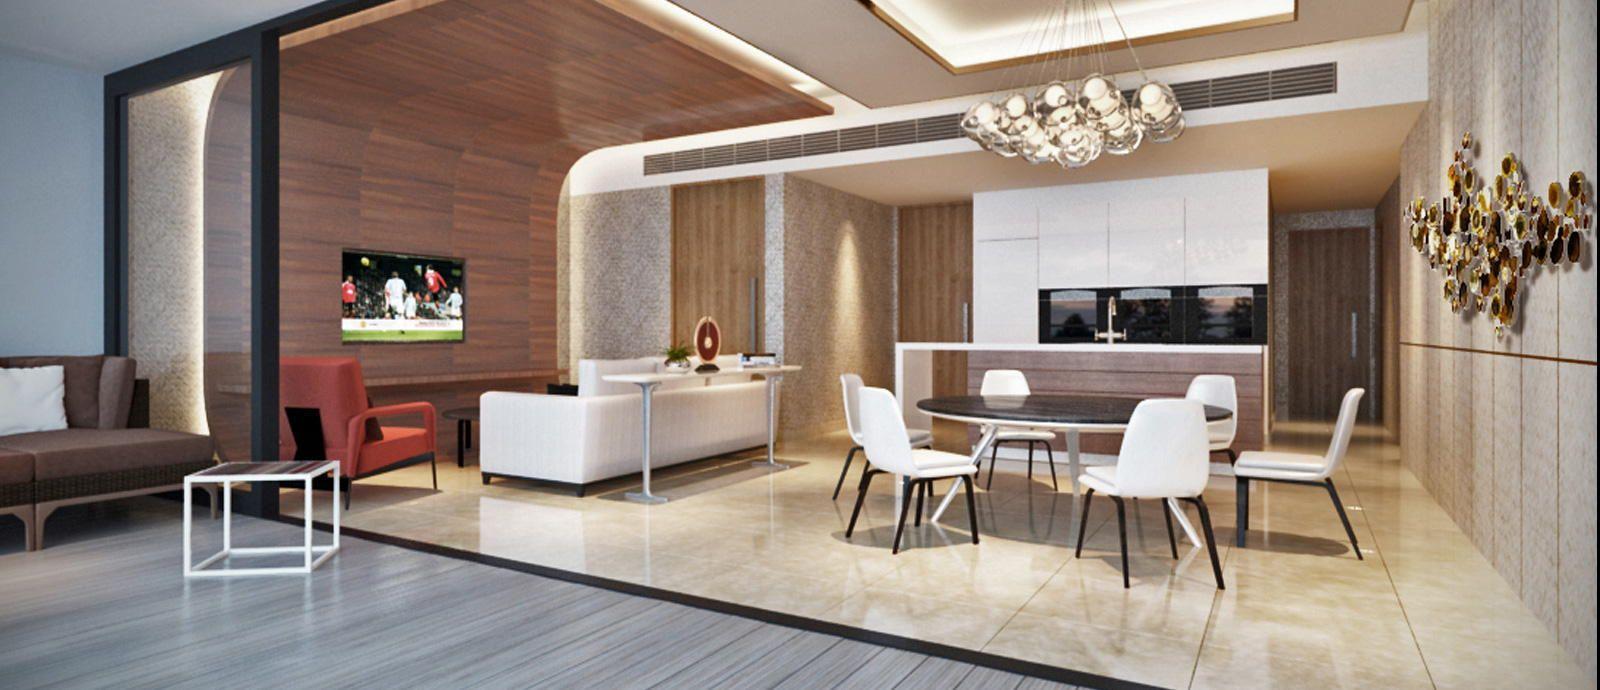 Factors that successful interior design companies always also directory home designs decorating rh pinterest